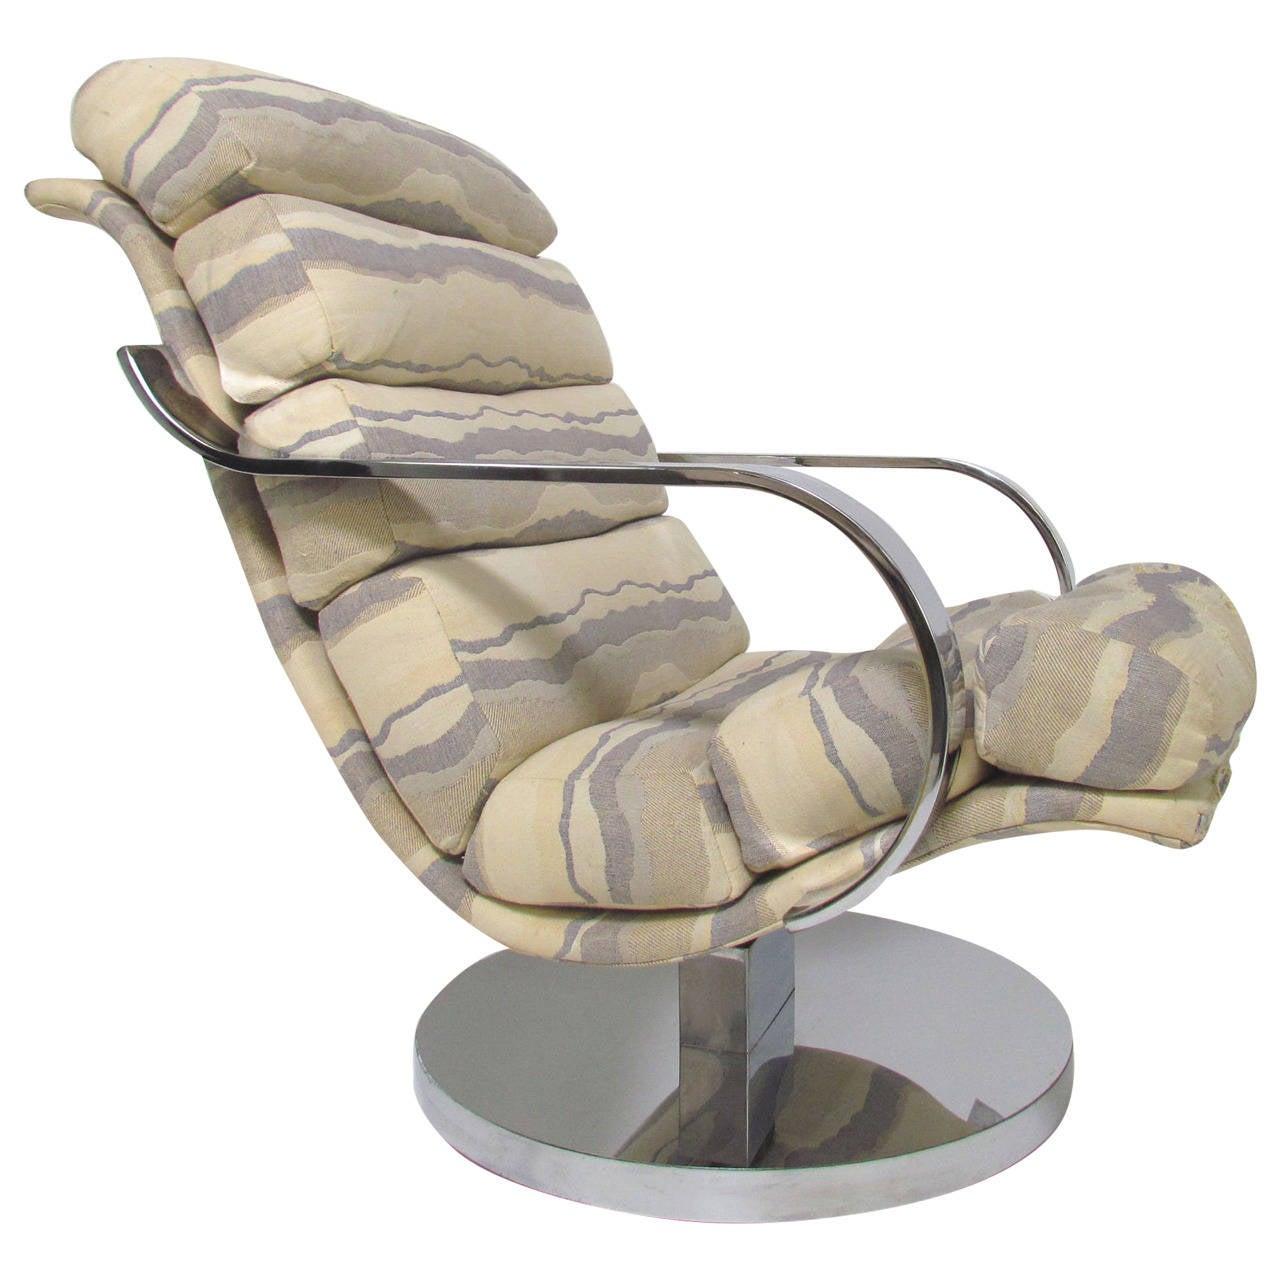 Swivel Rocker Lounge Chair By Milo Baughman At 1stdibs